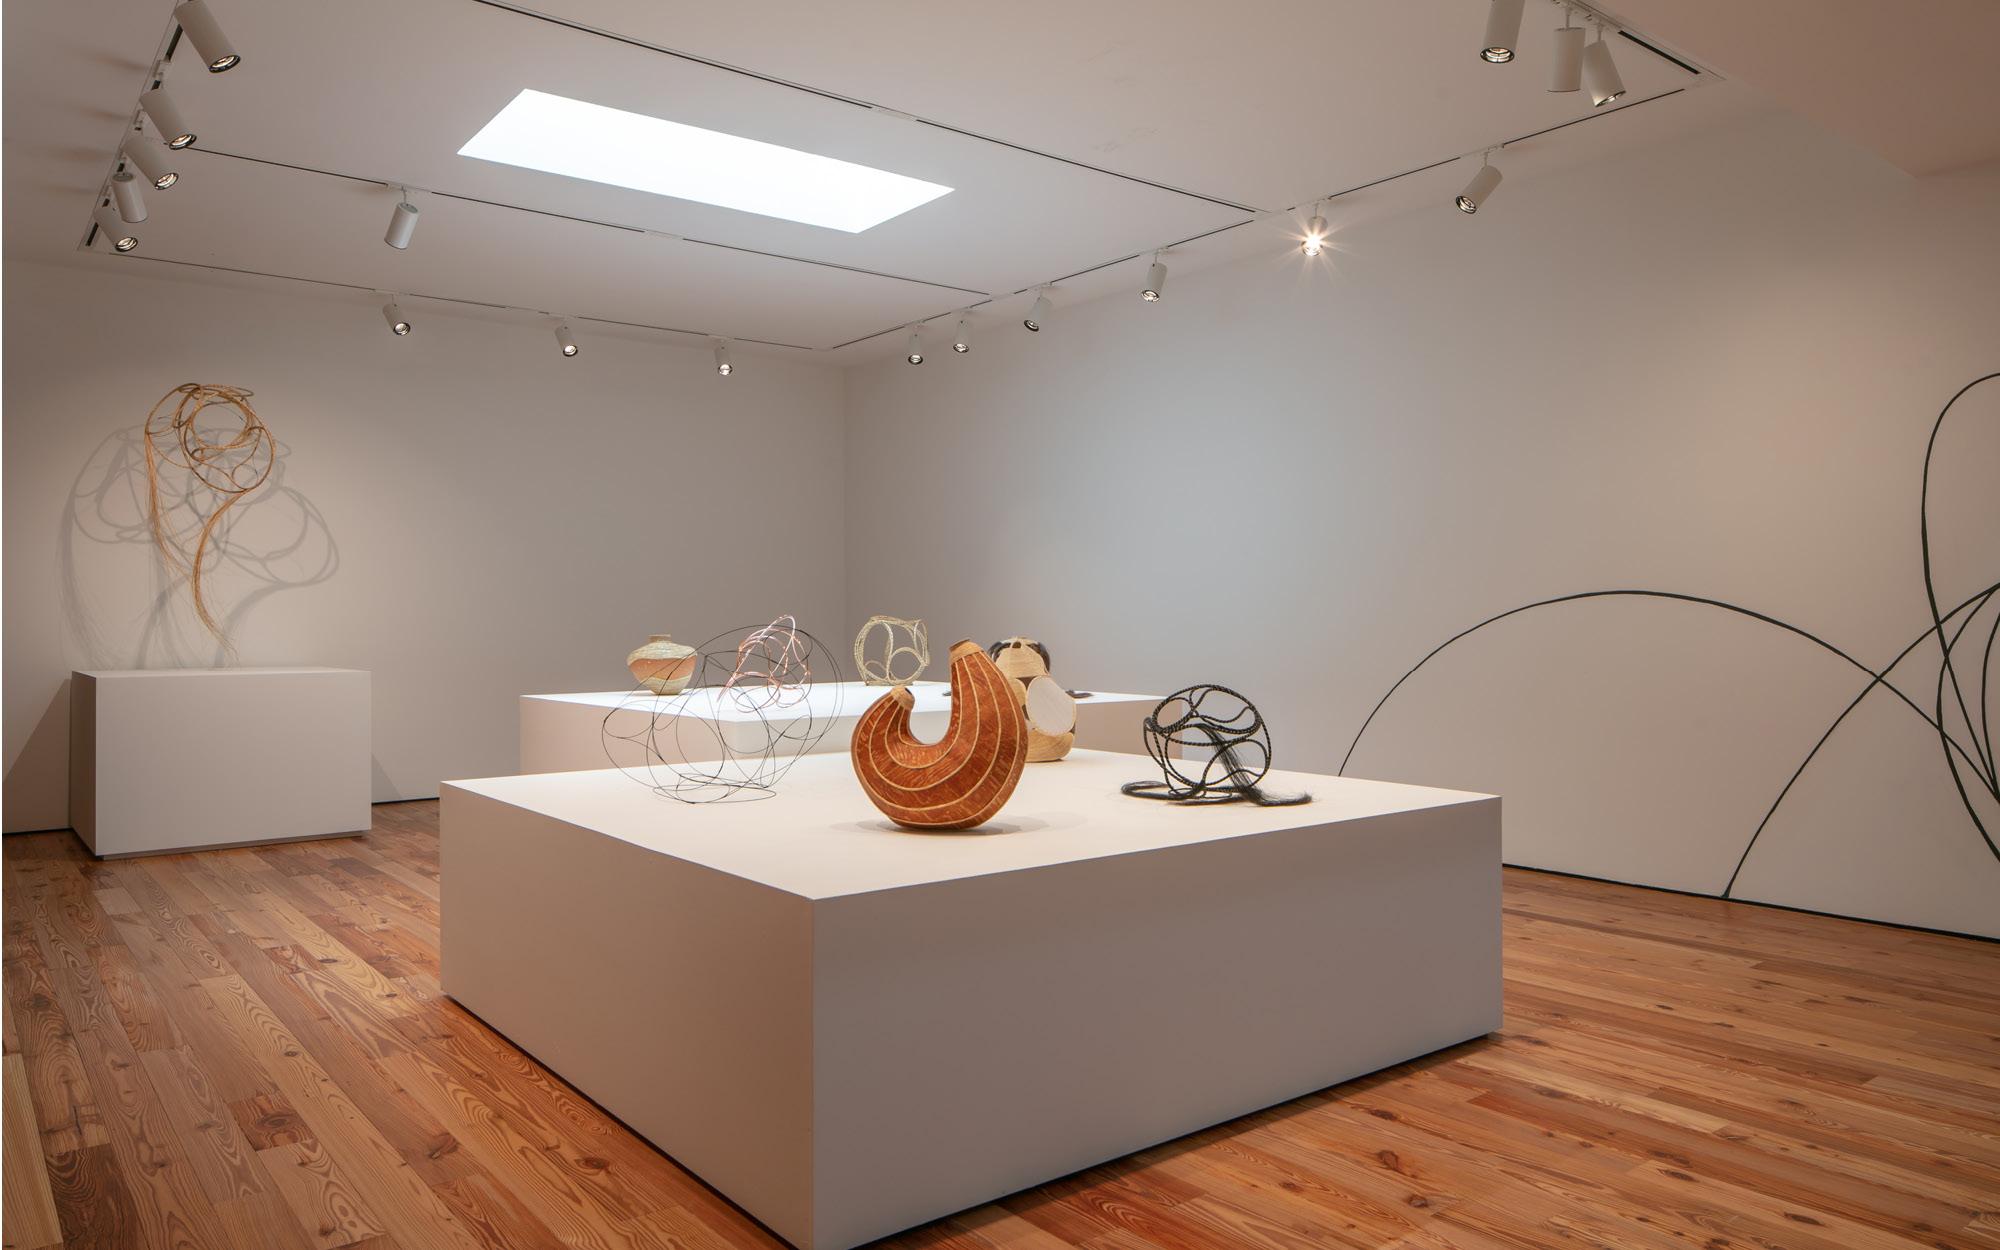 "Installation view of ""Unraveling: Aranda\Lasch + Terrol Dew Johnson"". On view at Sarasota Art Museum, June 12 - September 26, 2021, Photo: Ryan Gamma"